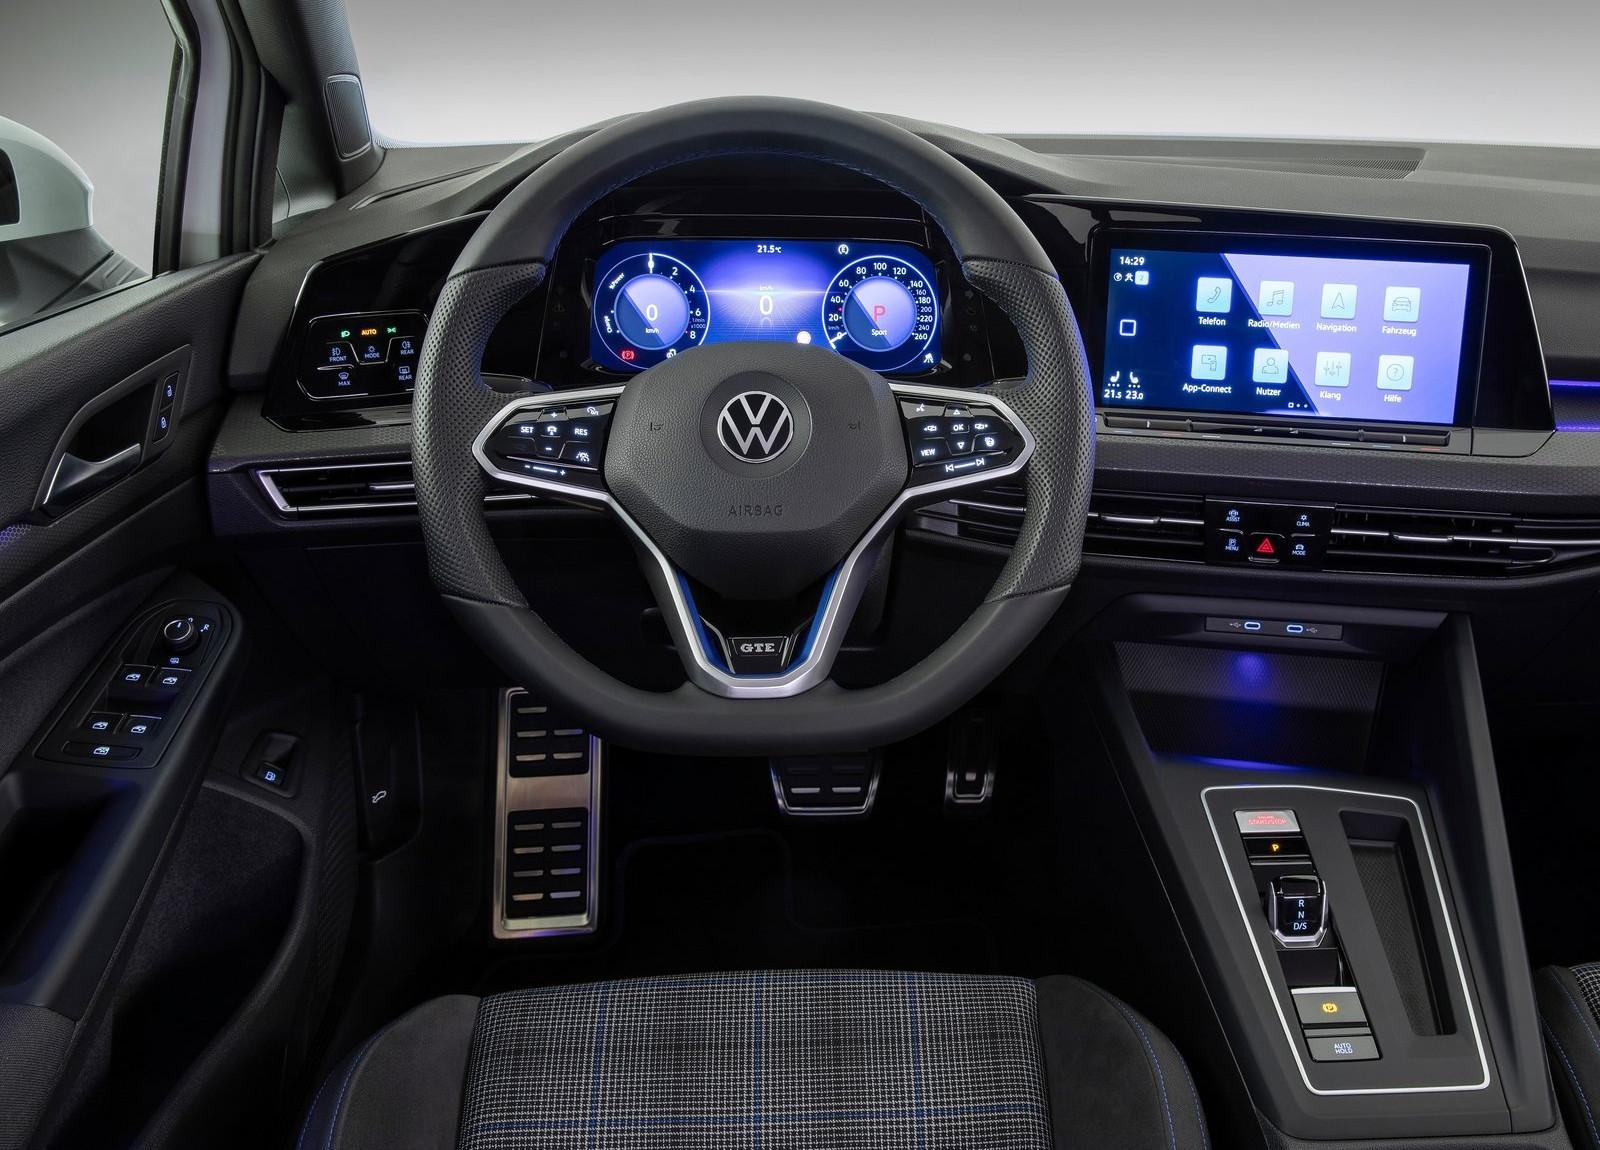 VW Golf GTE - VW Golf GTE